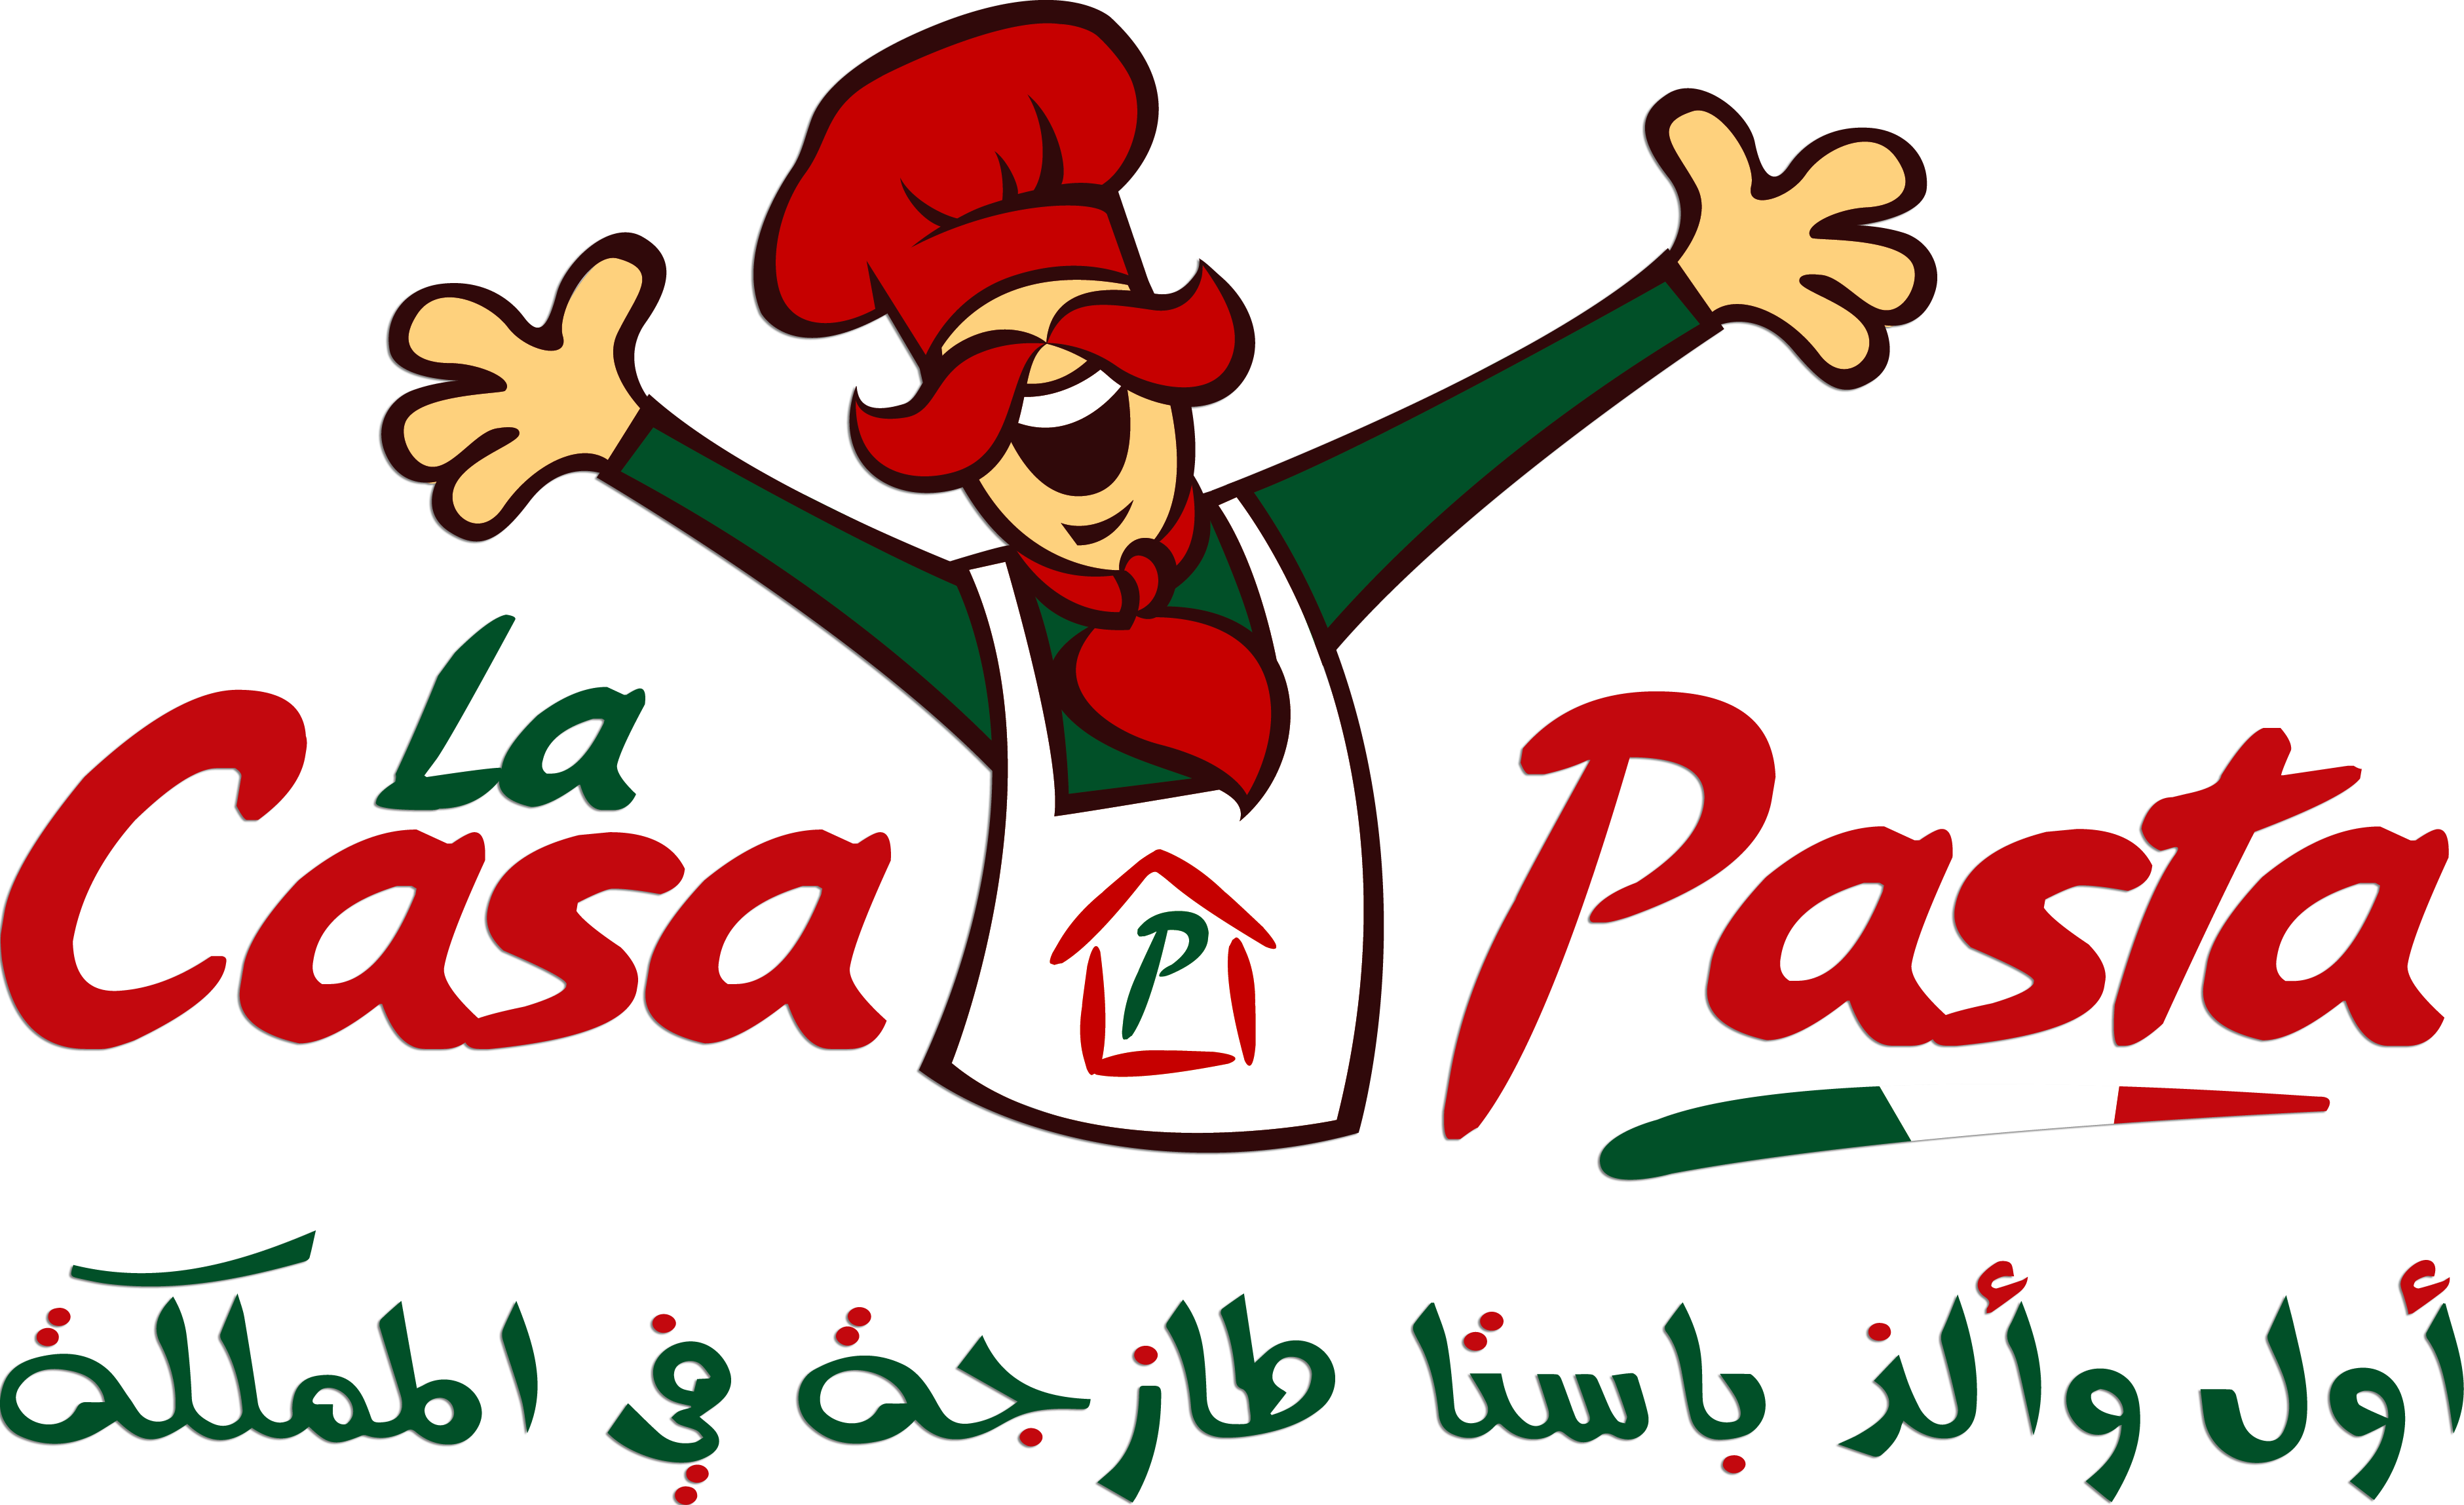 La casa in saudi. Pasta clipart restaurant food